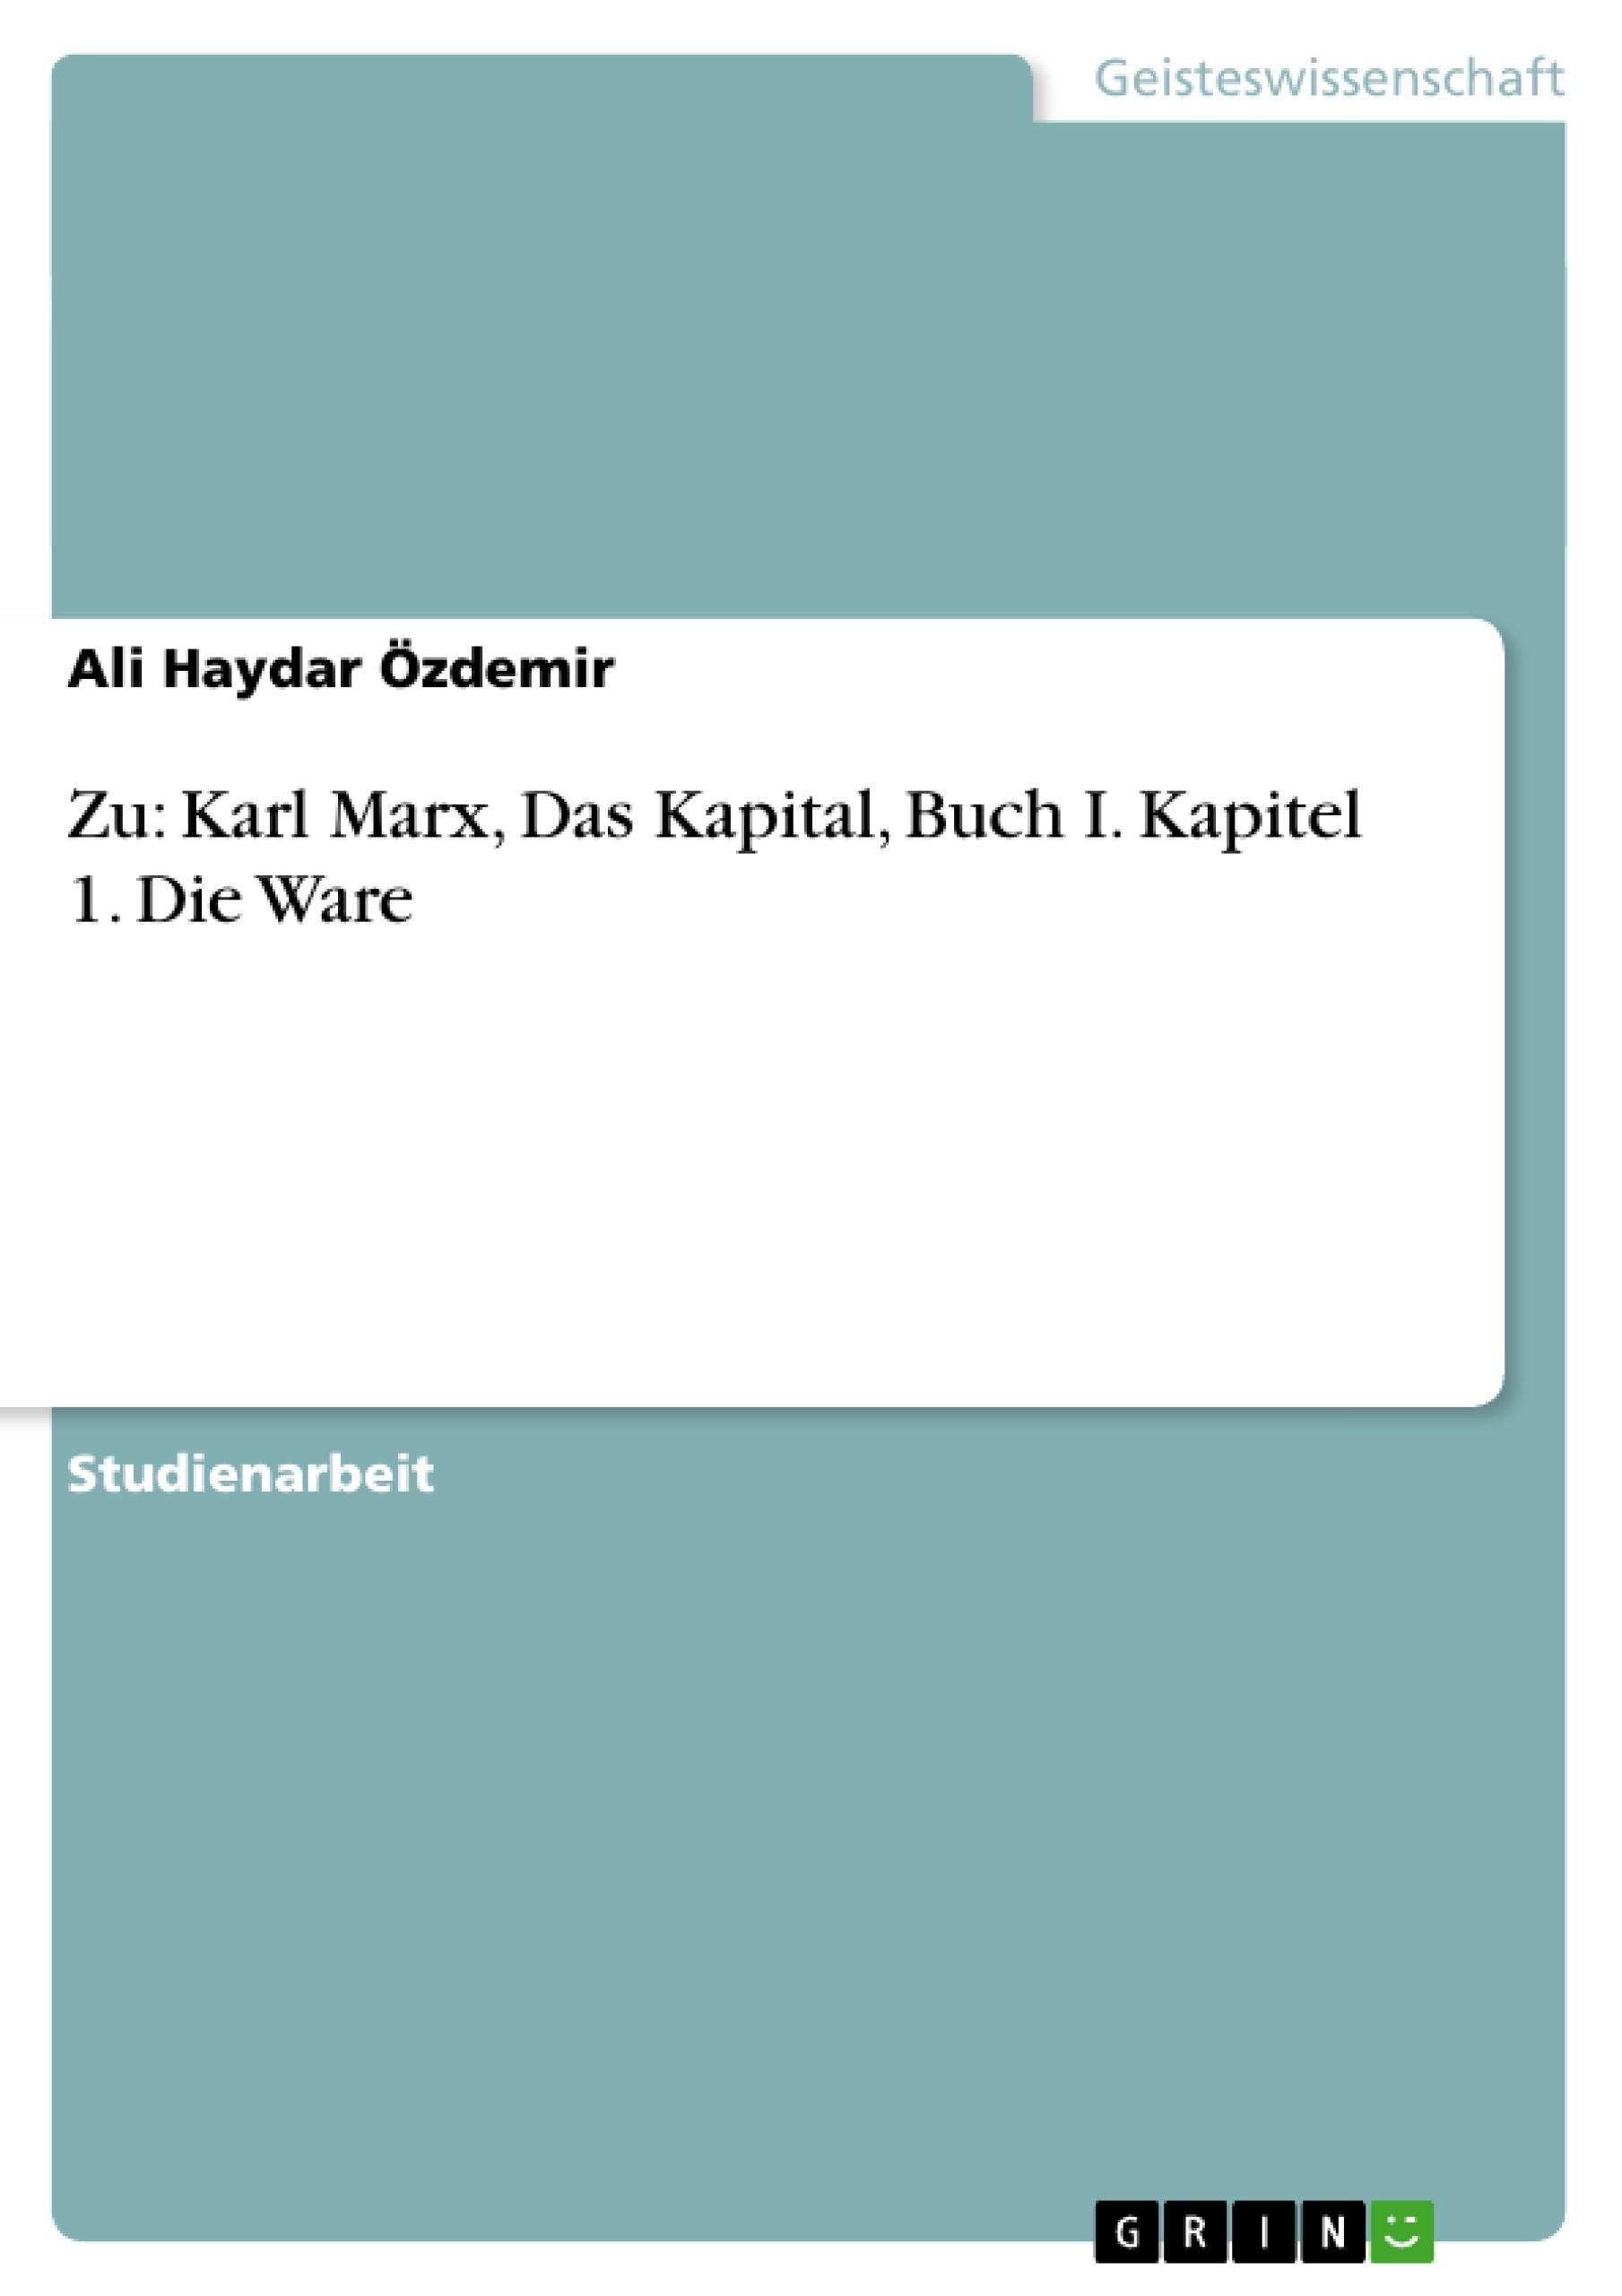 Titel: Zu: Karl Marx, Das Kapital, Buch I. Kapitel 1. Die Ware